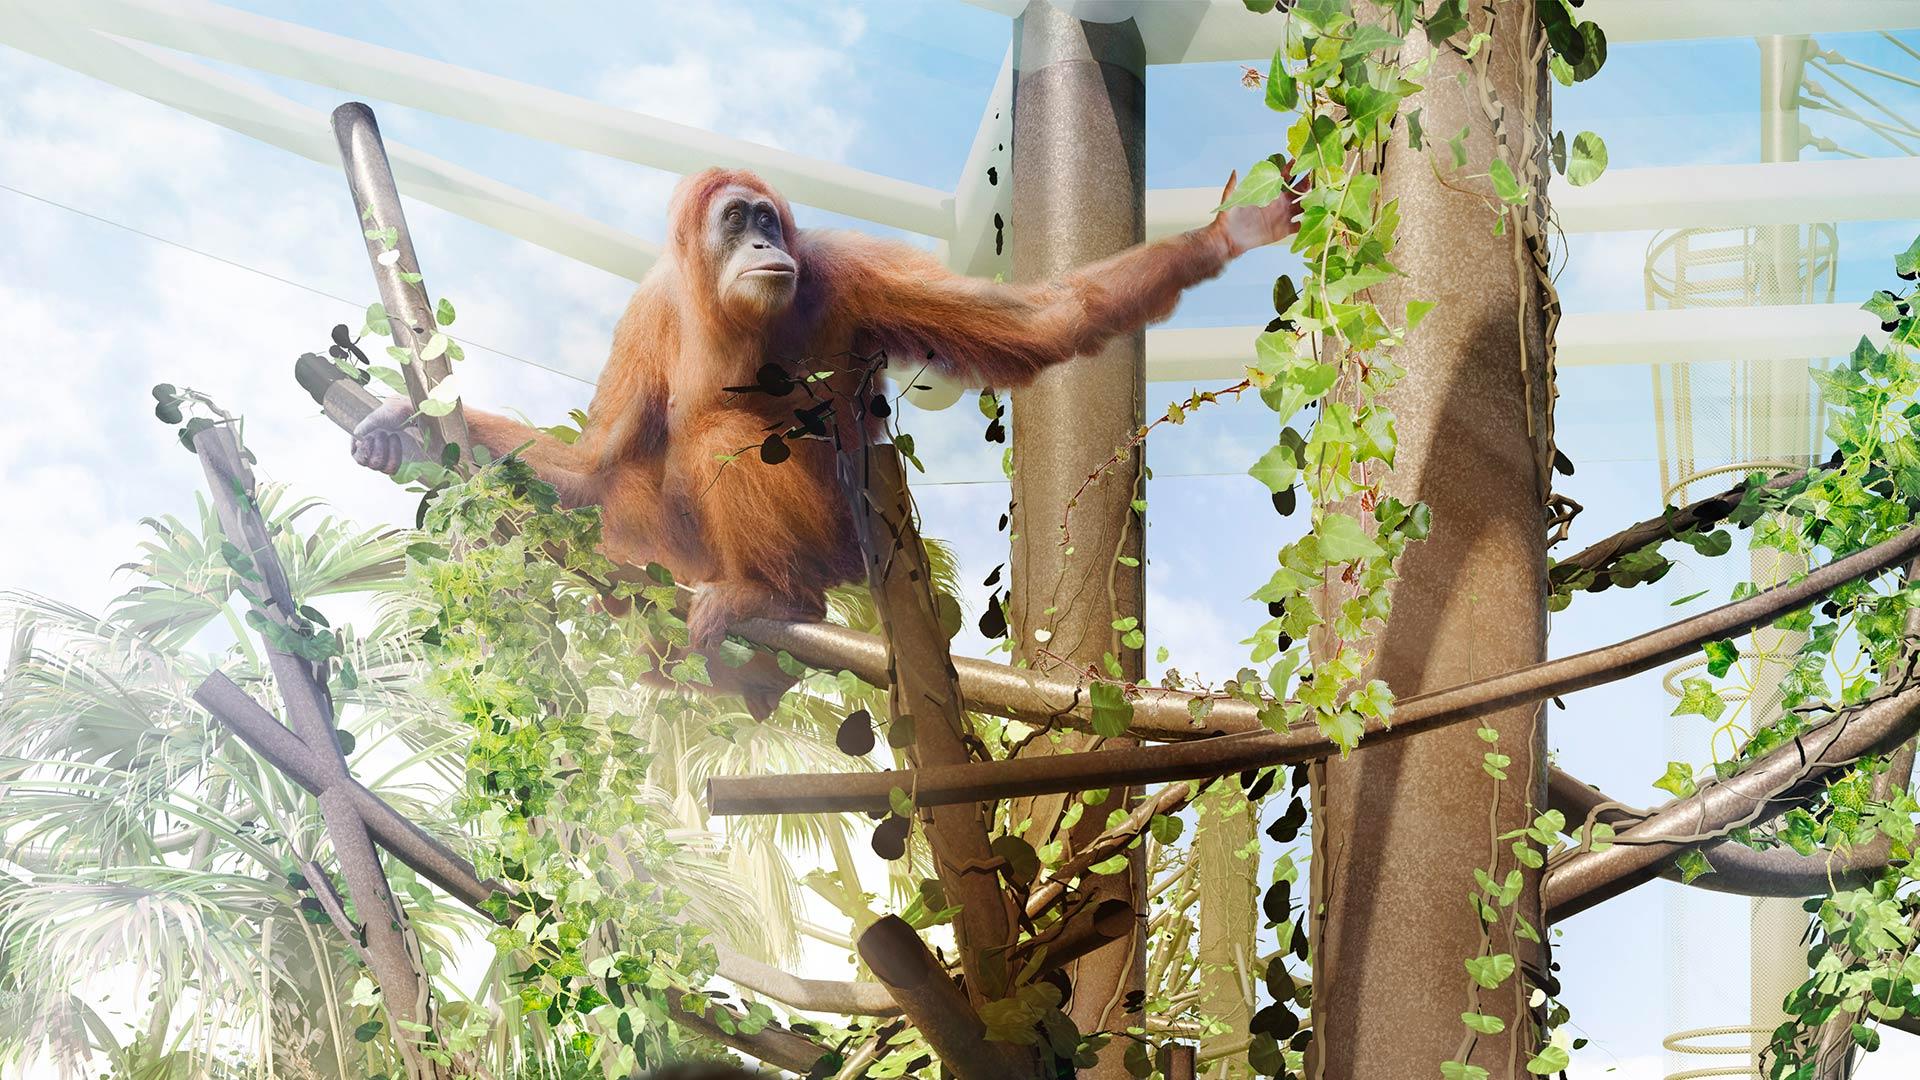 https://rfacdn.nz/zoo/assets/media/high-canopy-gallery.jpg